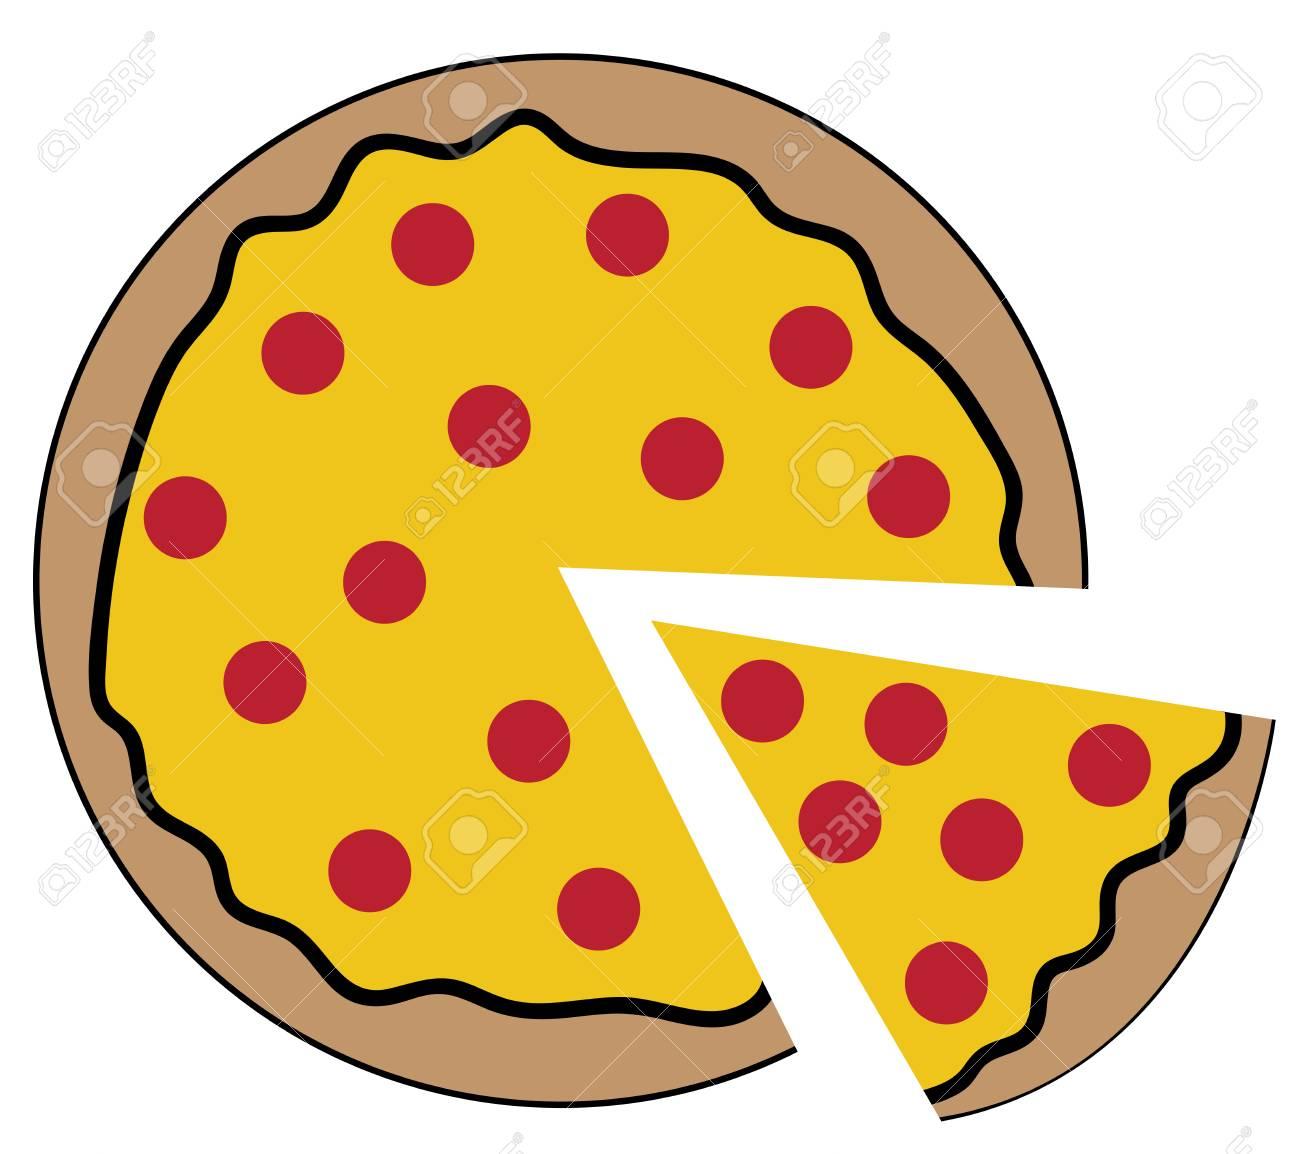 pepperoni pizza in cartoon illustration royalty free cliparts rh 123rf com